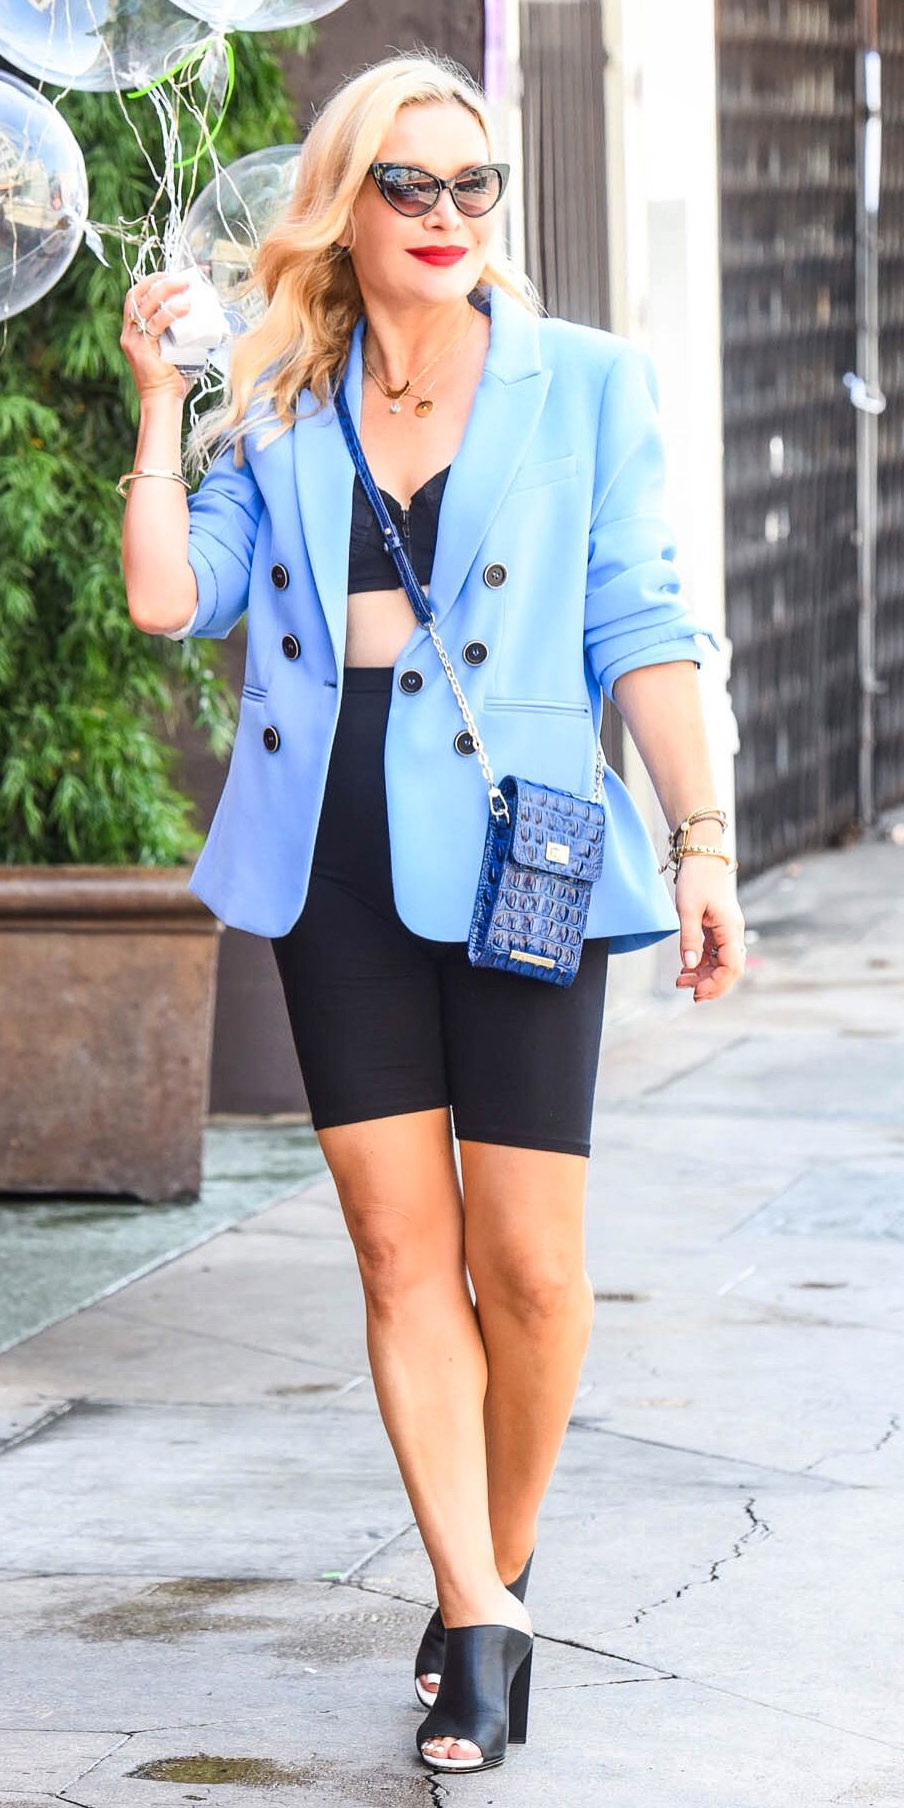 black-shorts-cycling-bike-blue-light-jacket-blazer-blue-bag-crossbody-sun-necklace-black-shoe-sandalh-black-bralette-spring-summer-lunch.jpg